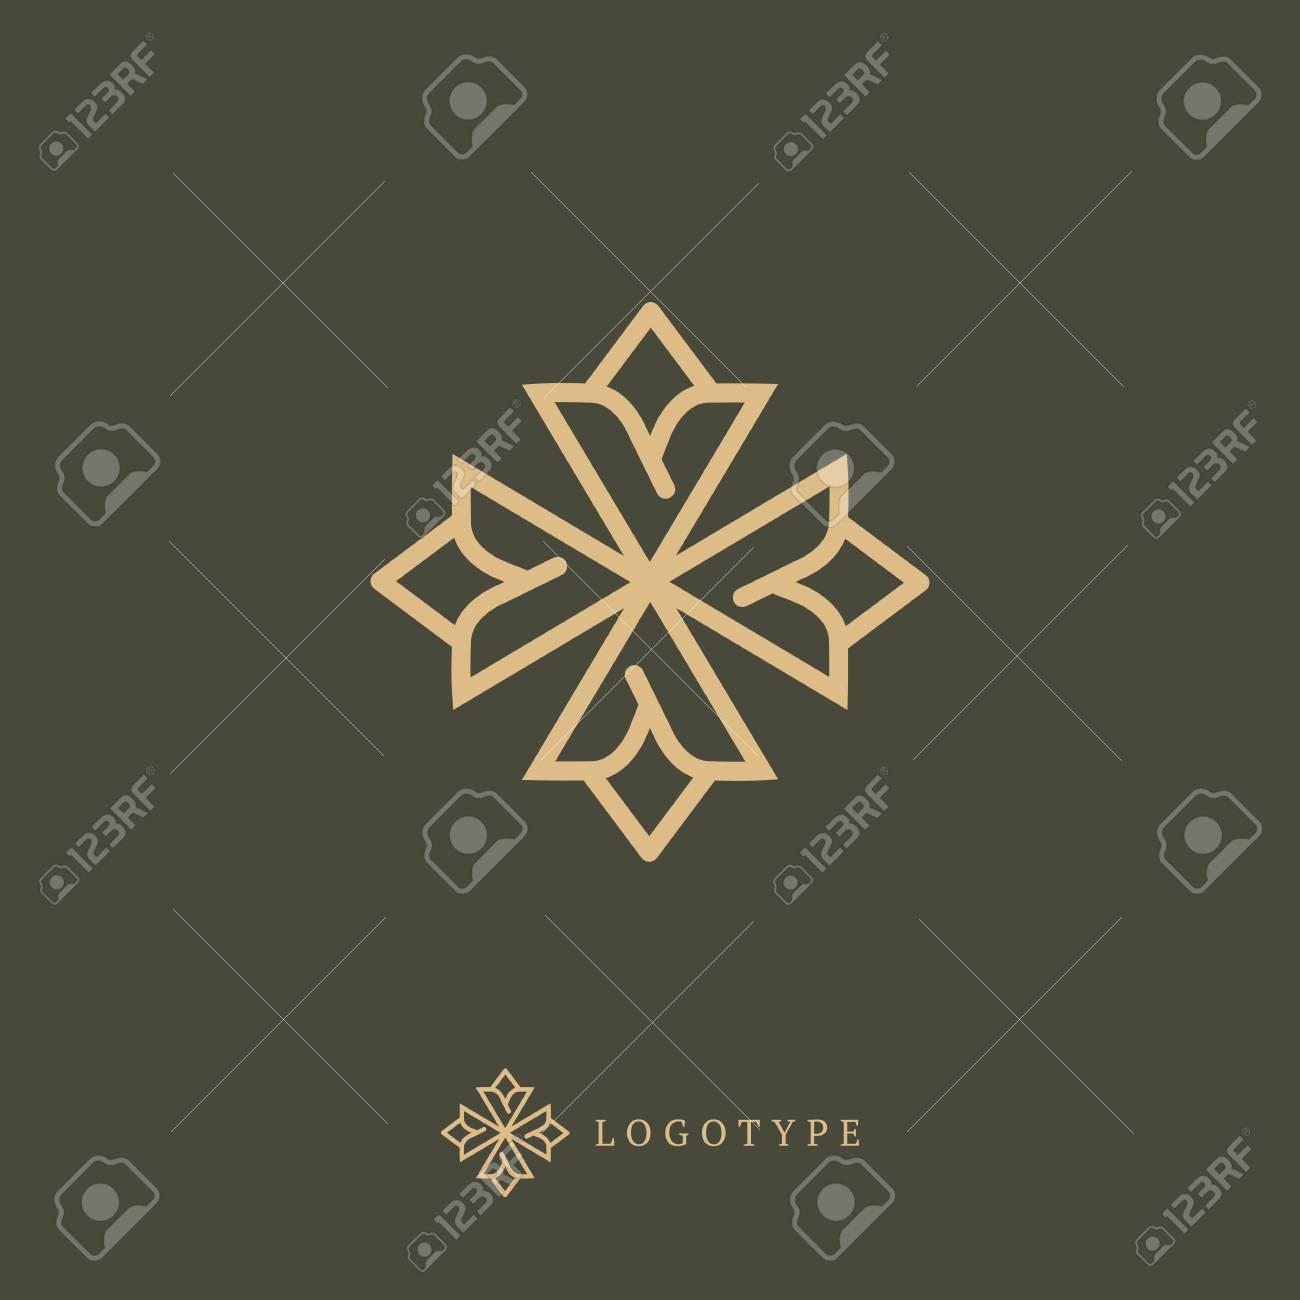 Emblem luxury beauty spa, cosmetics, jewerly, hotel, restaurant Wedding elegant outline frame - 106347051